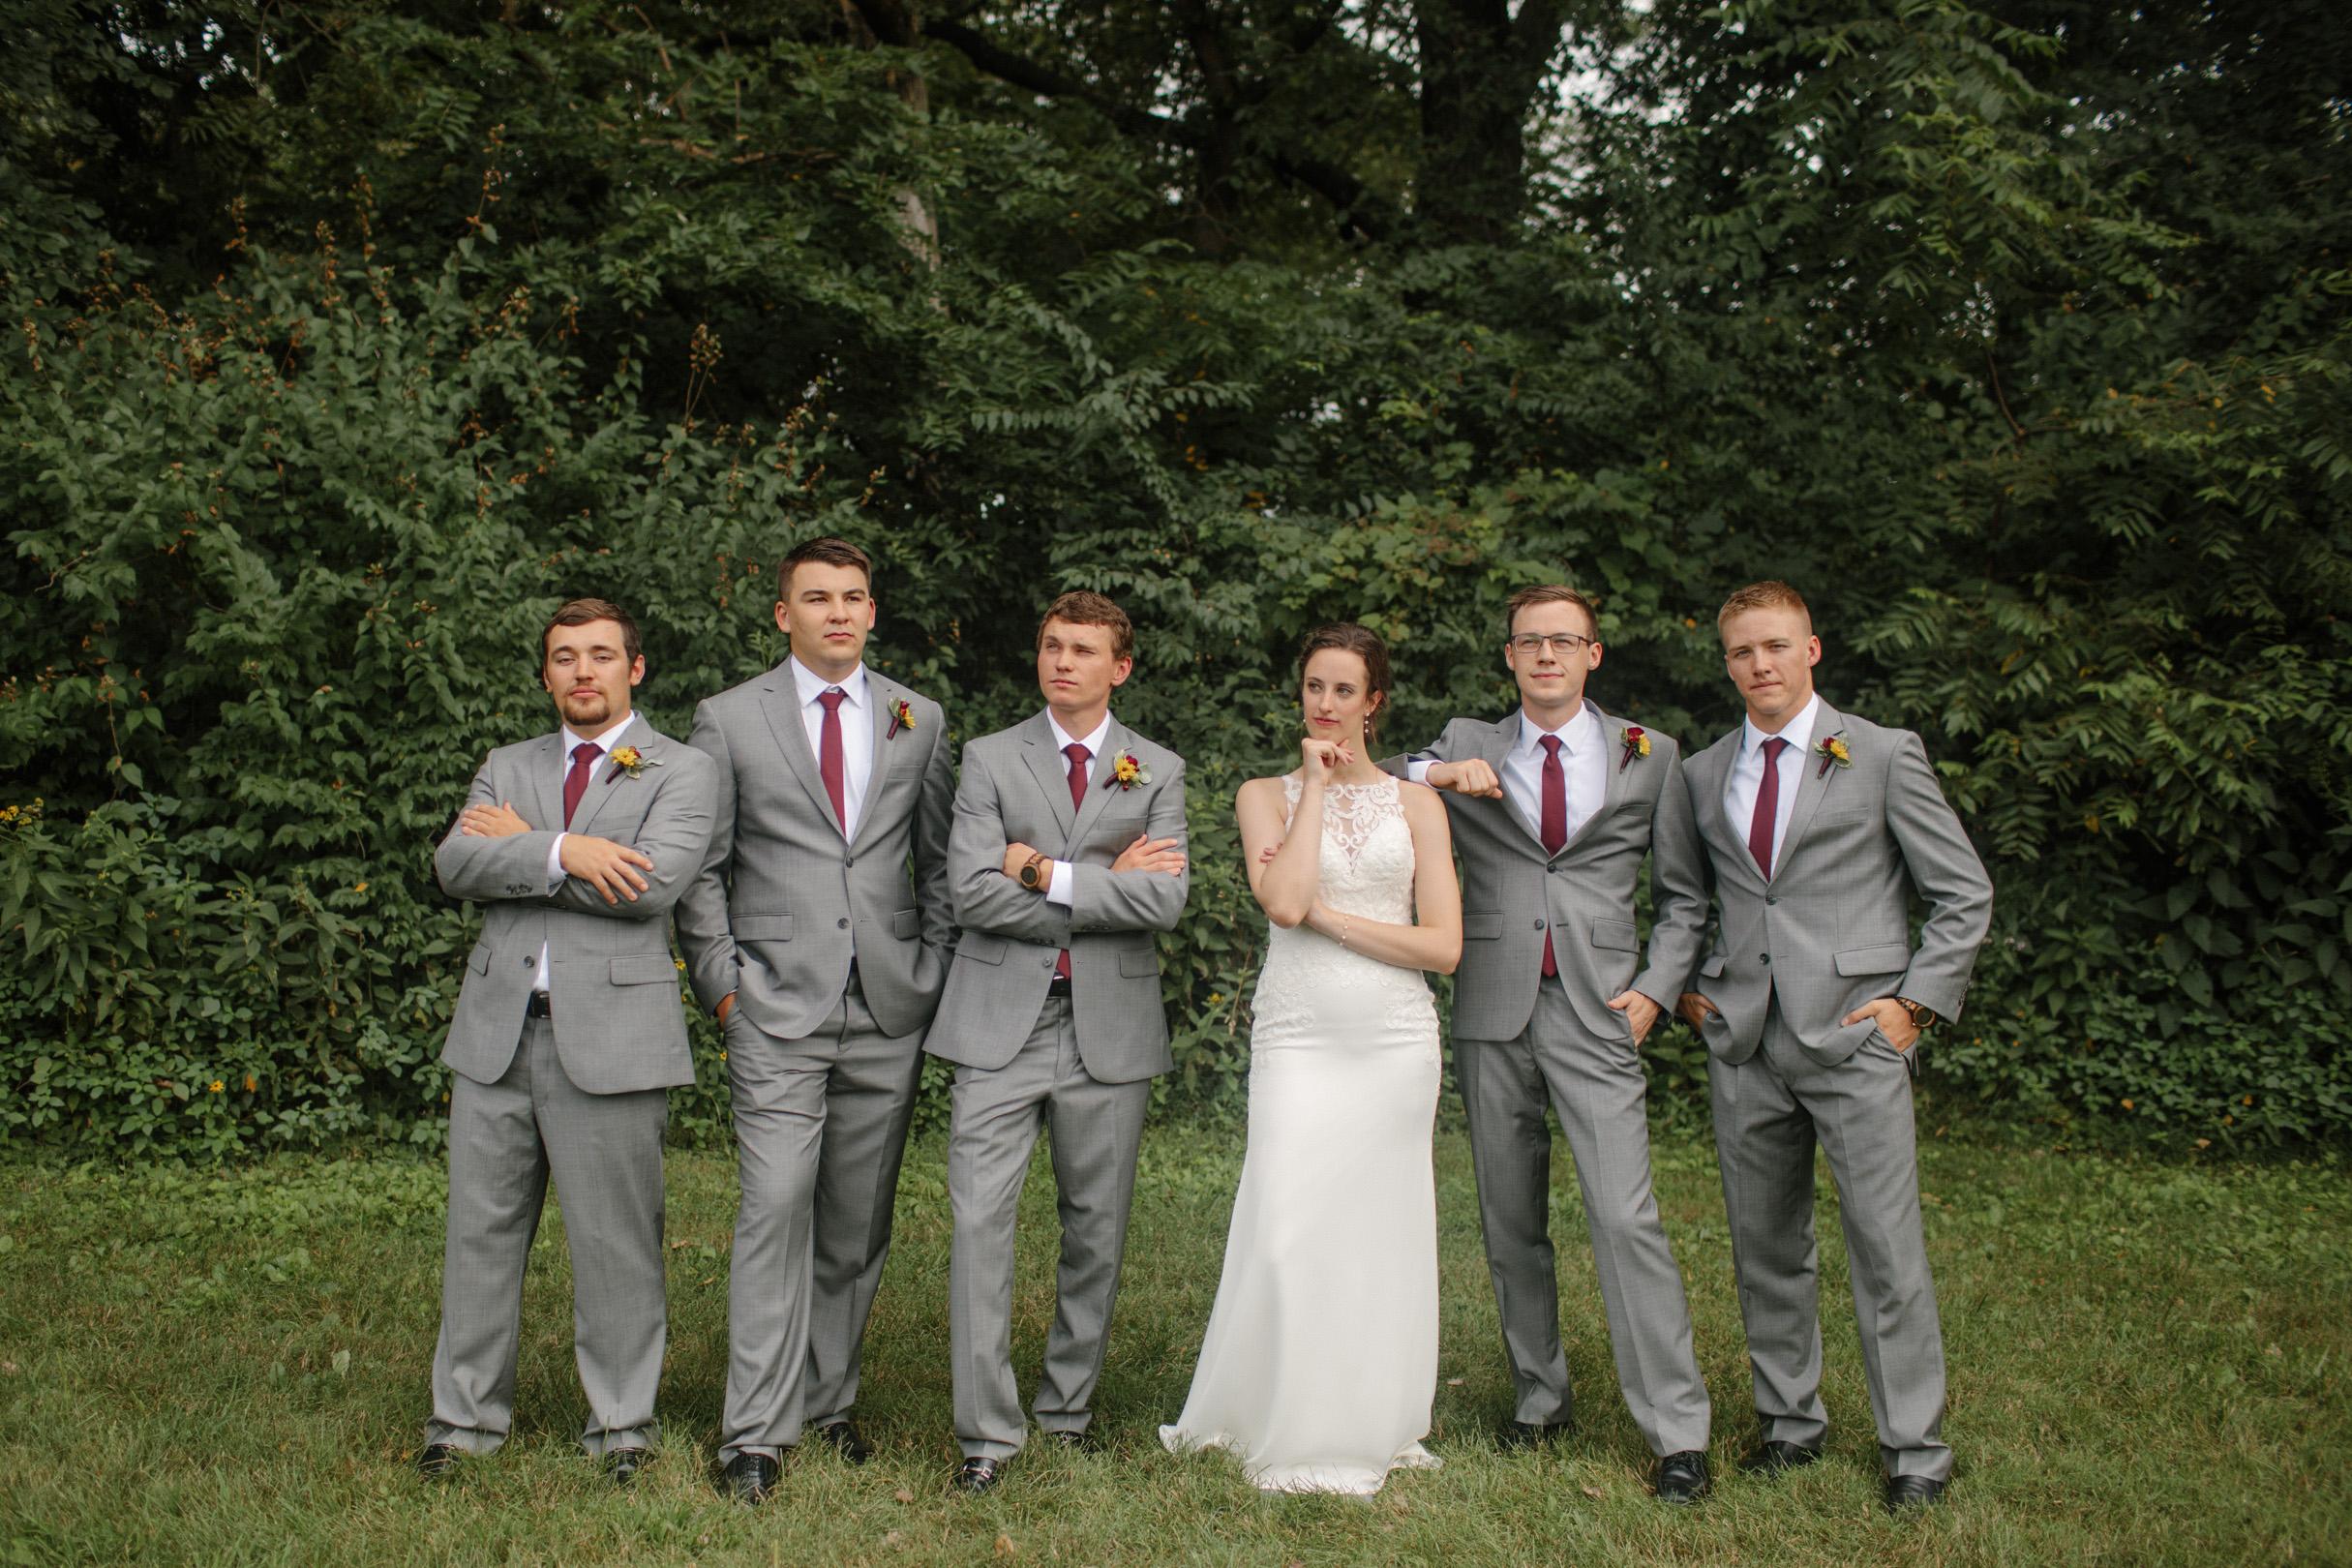 gabby_david_the_chateau_white_oak_wedding_51.jpg